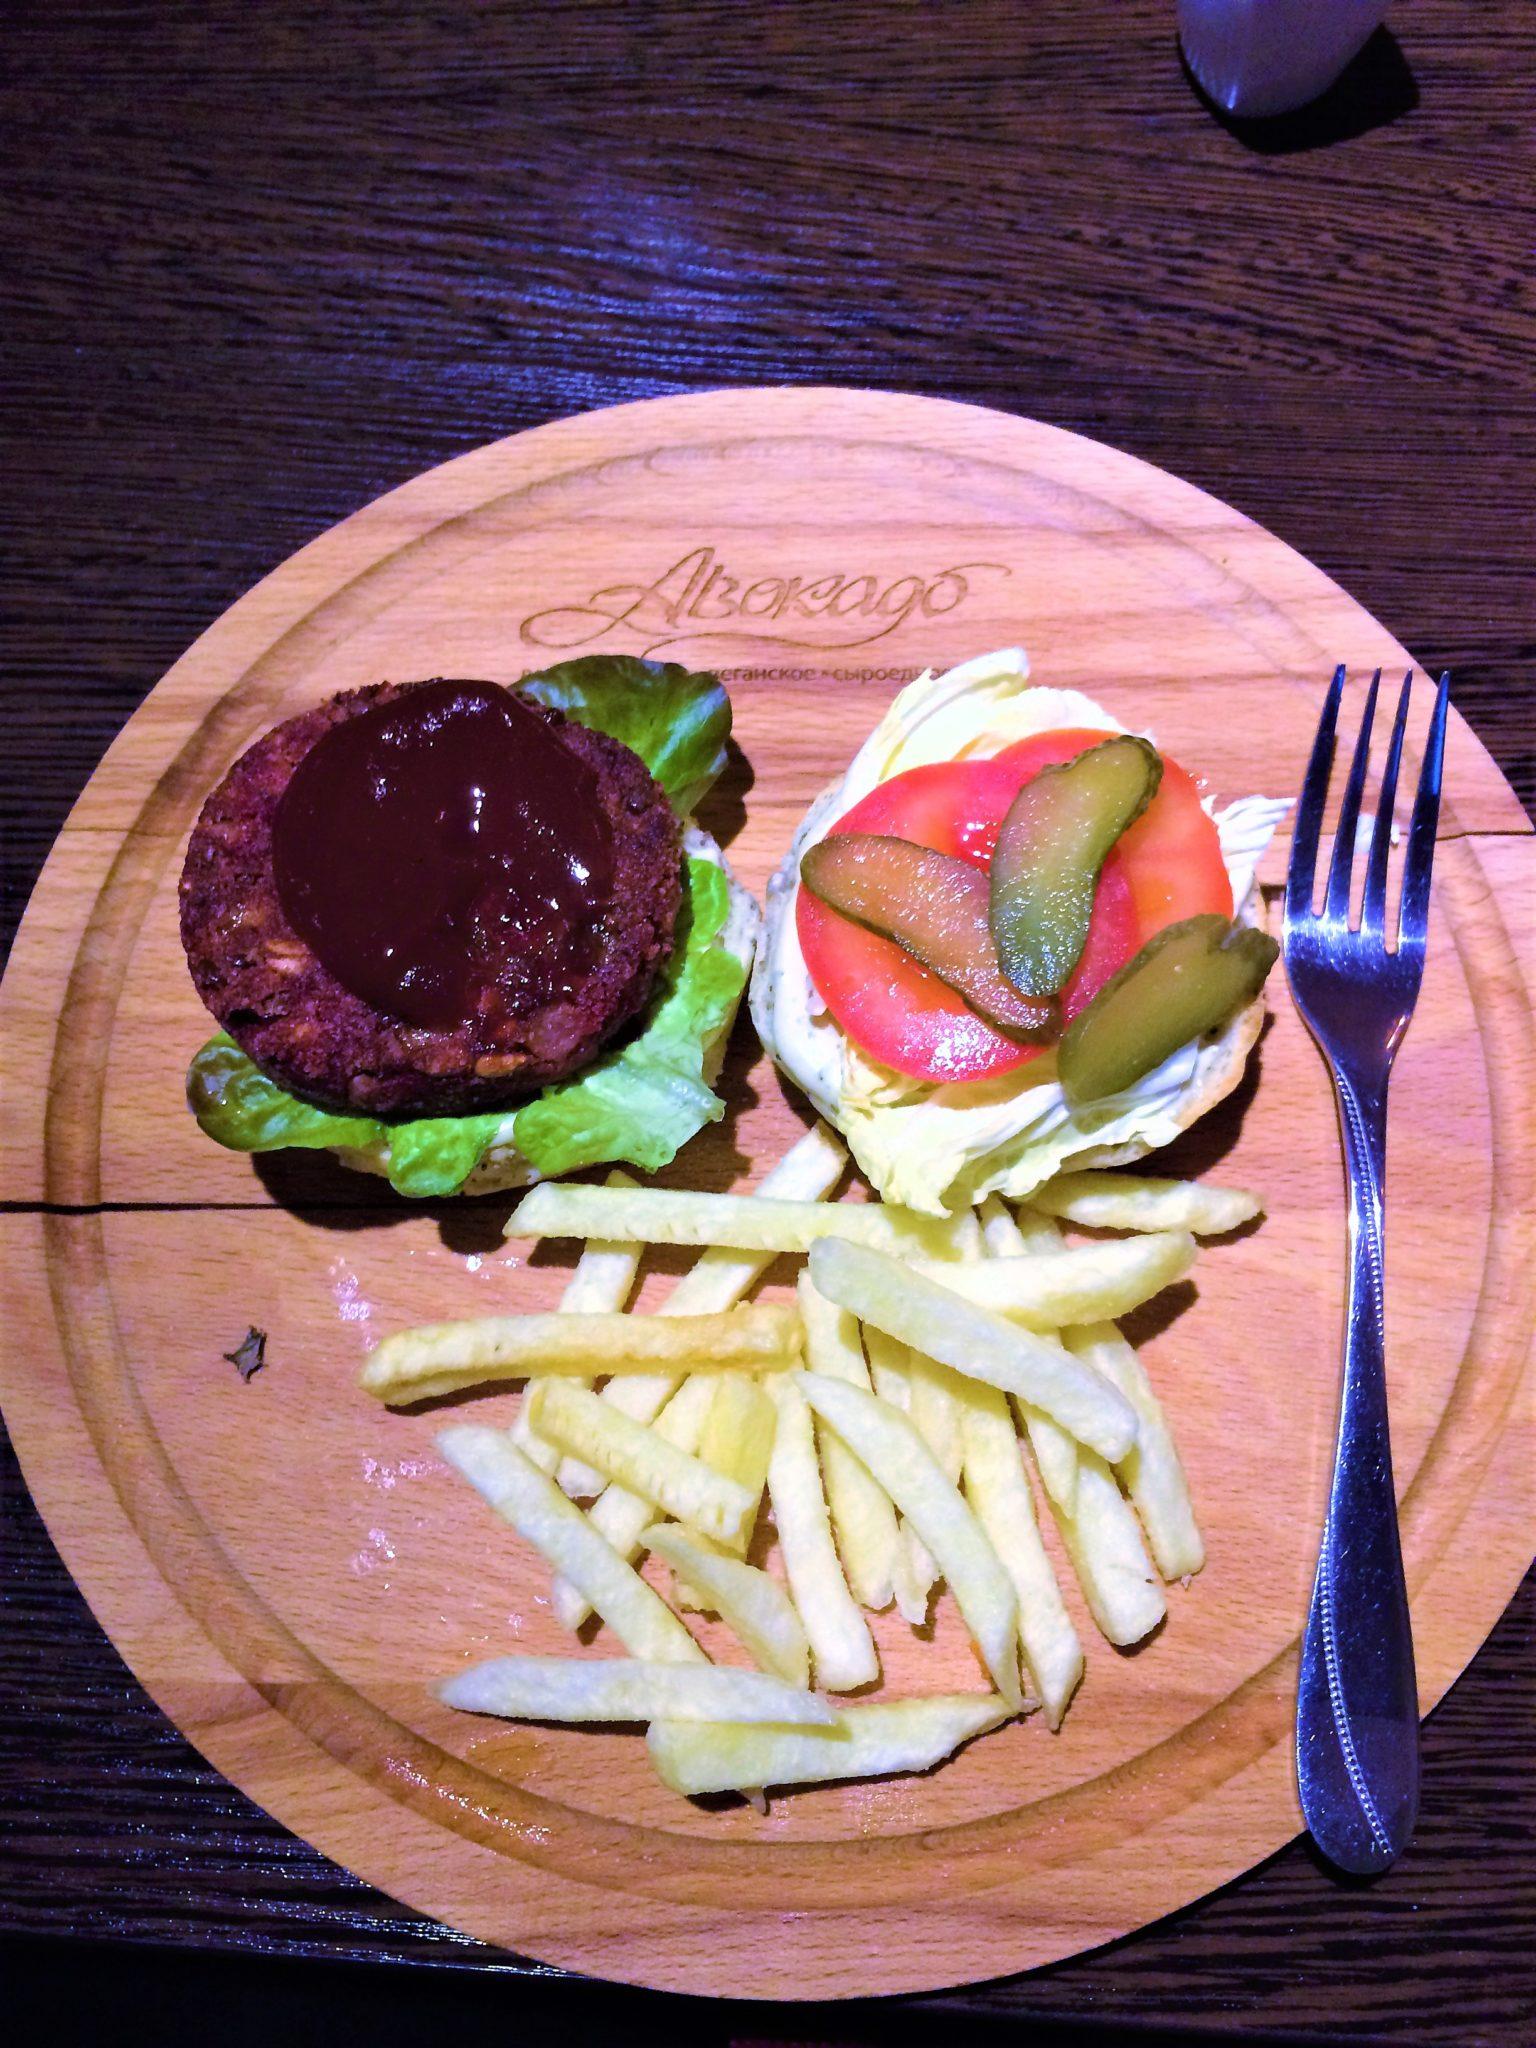 Avocado cafe Moscow main dish lentil burger